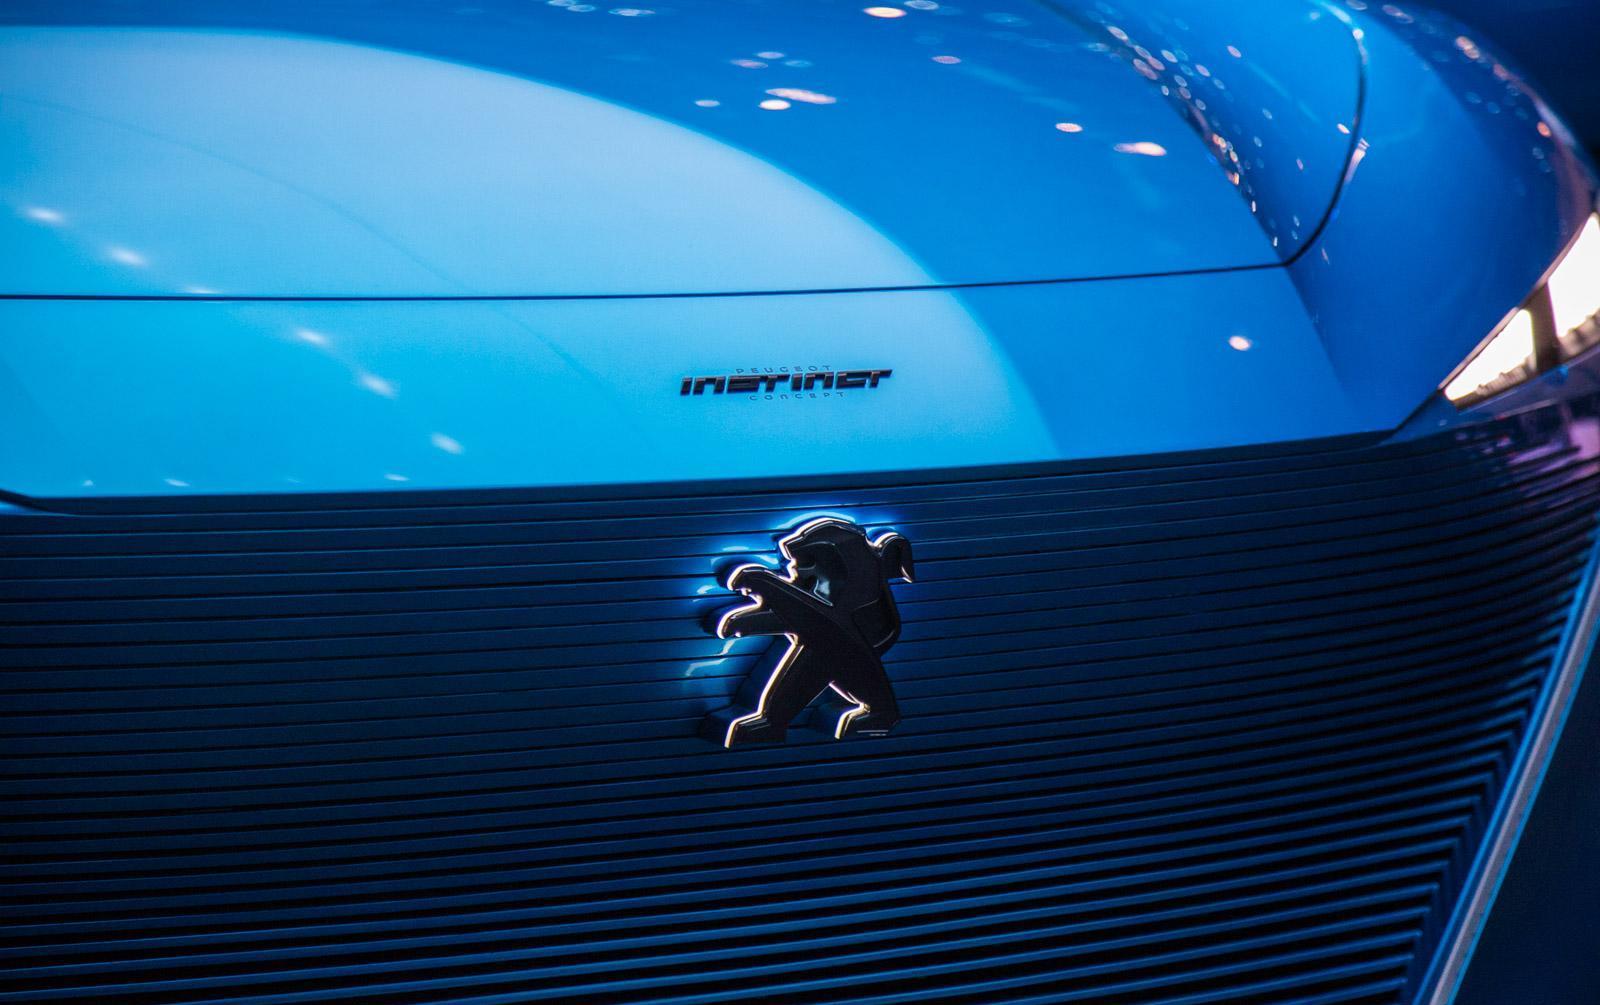 Peugeot-instinct-concept-006